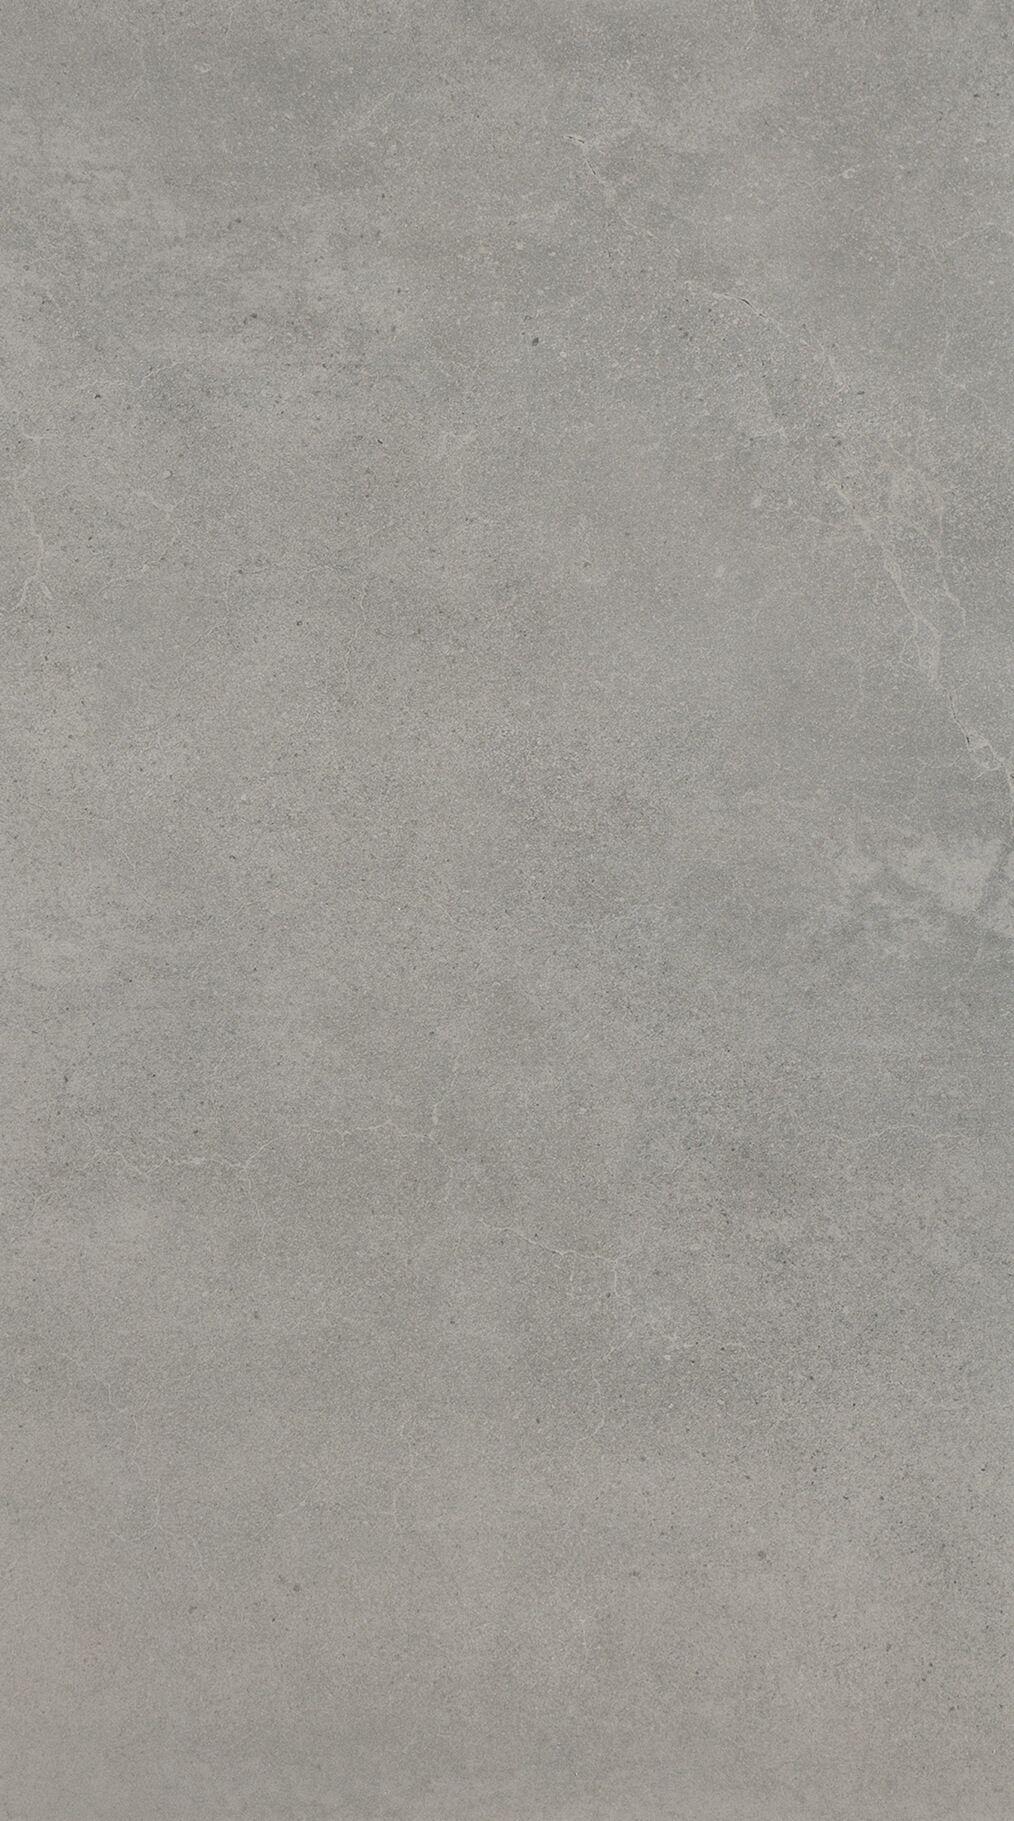 Micro cement concept tiles designer porcelain tiles and wood micro cement concept tiles designer porcelain tiles and wood effect floor tiles dailygadgetfo Image collections